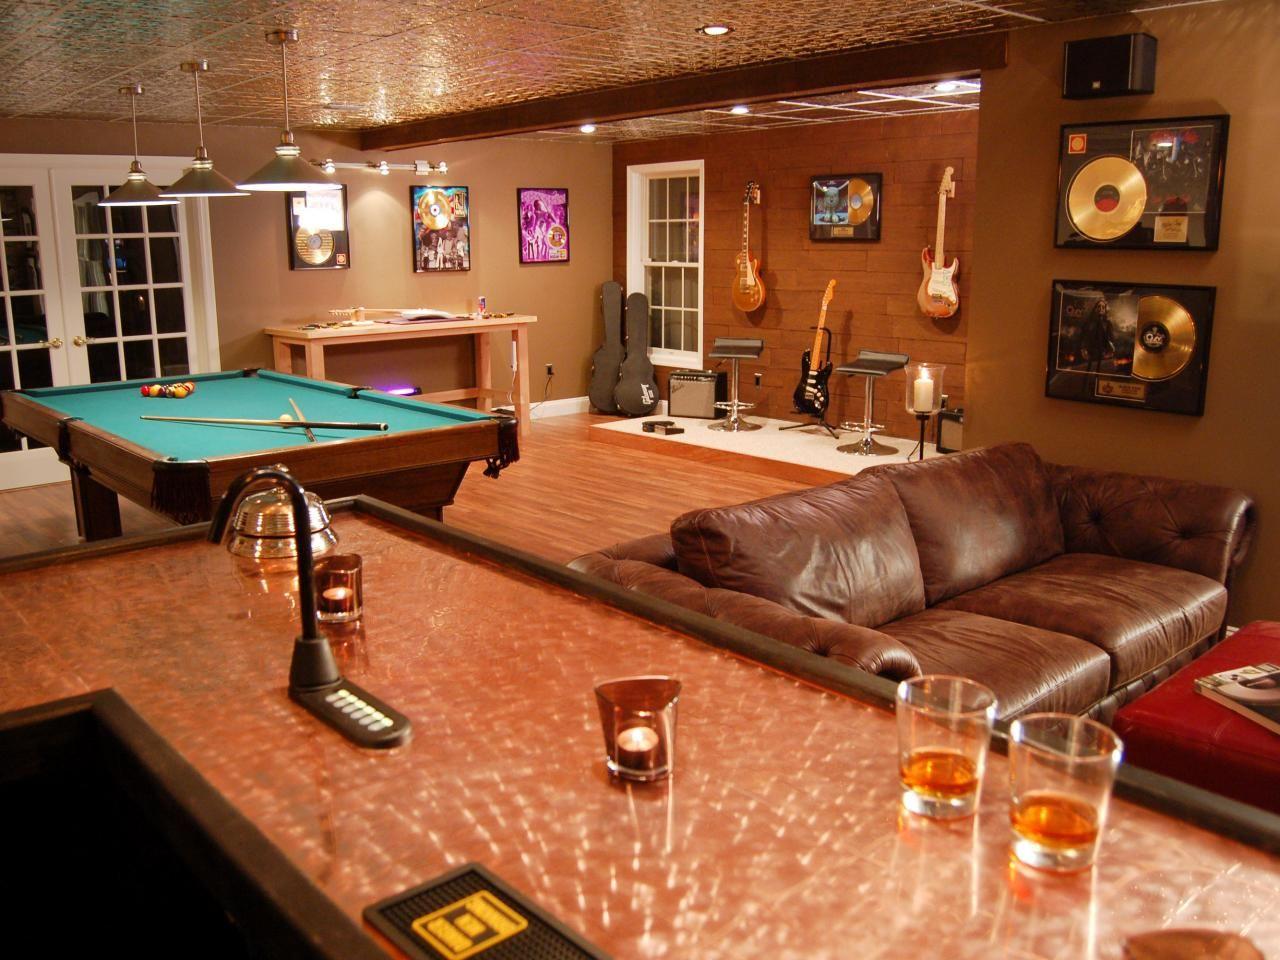 Man Cave Decor Questions : Man caves pool tables and bars men cave